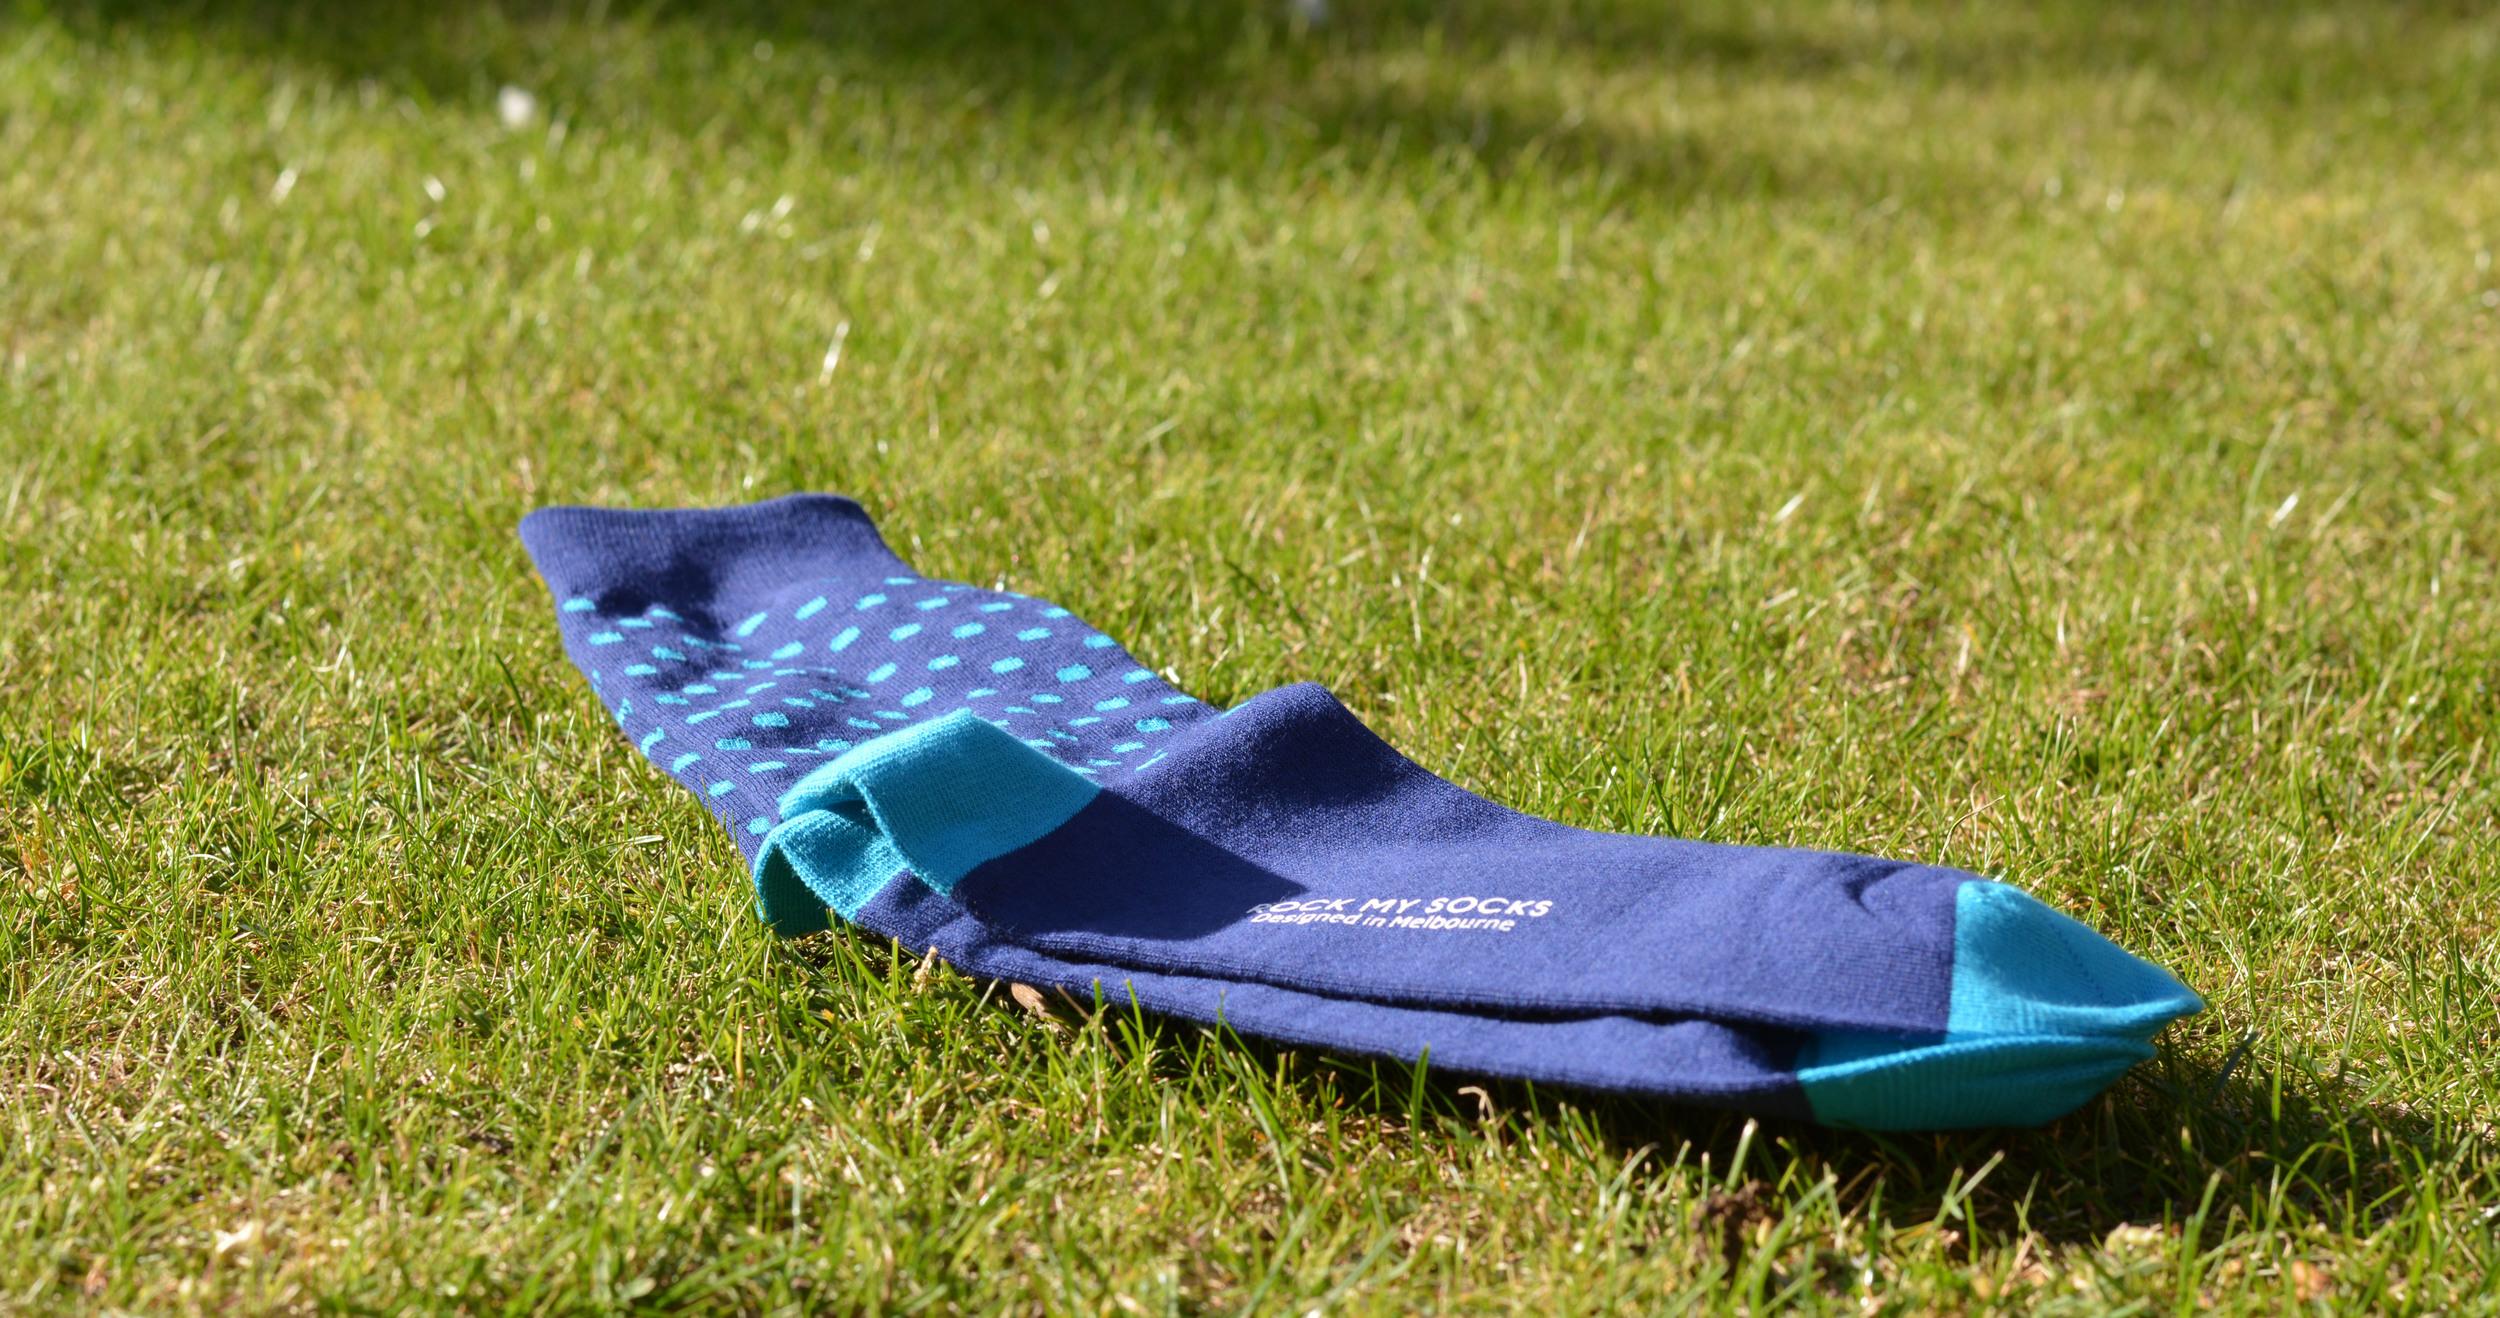 Rock My Socks | Sam Squire UK Male Fashion Blogger